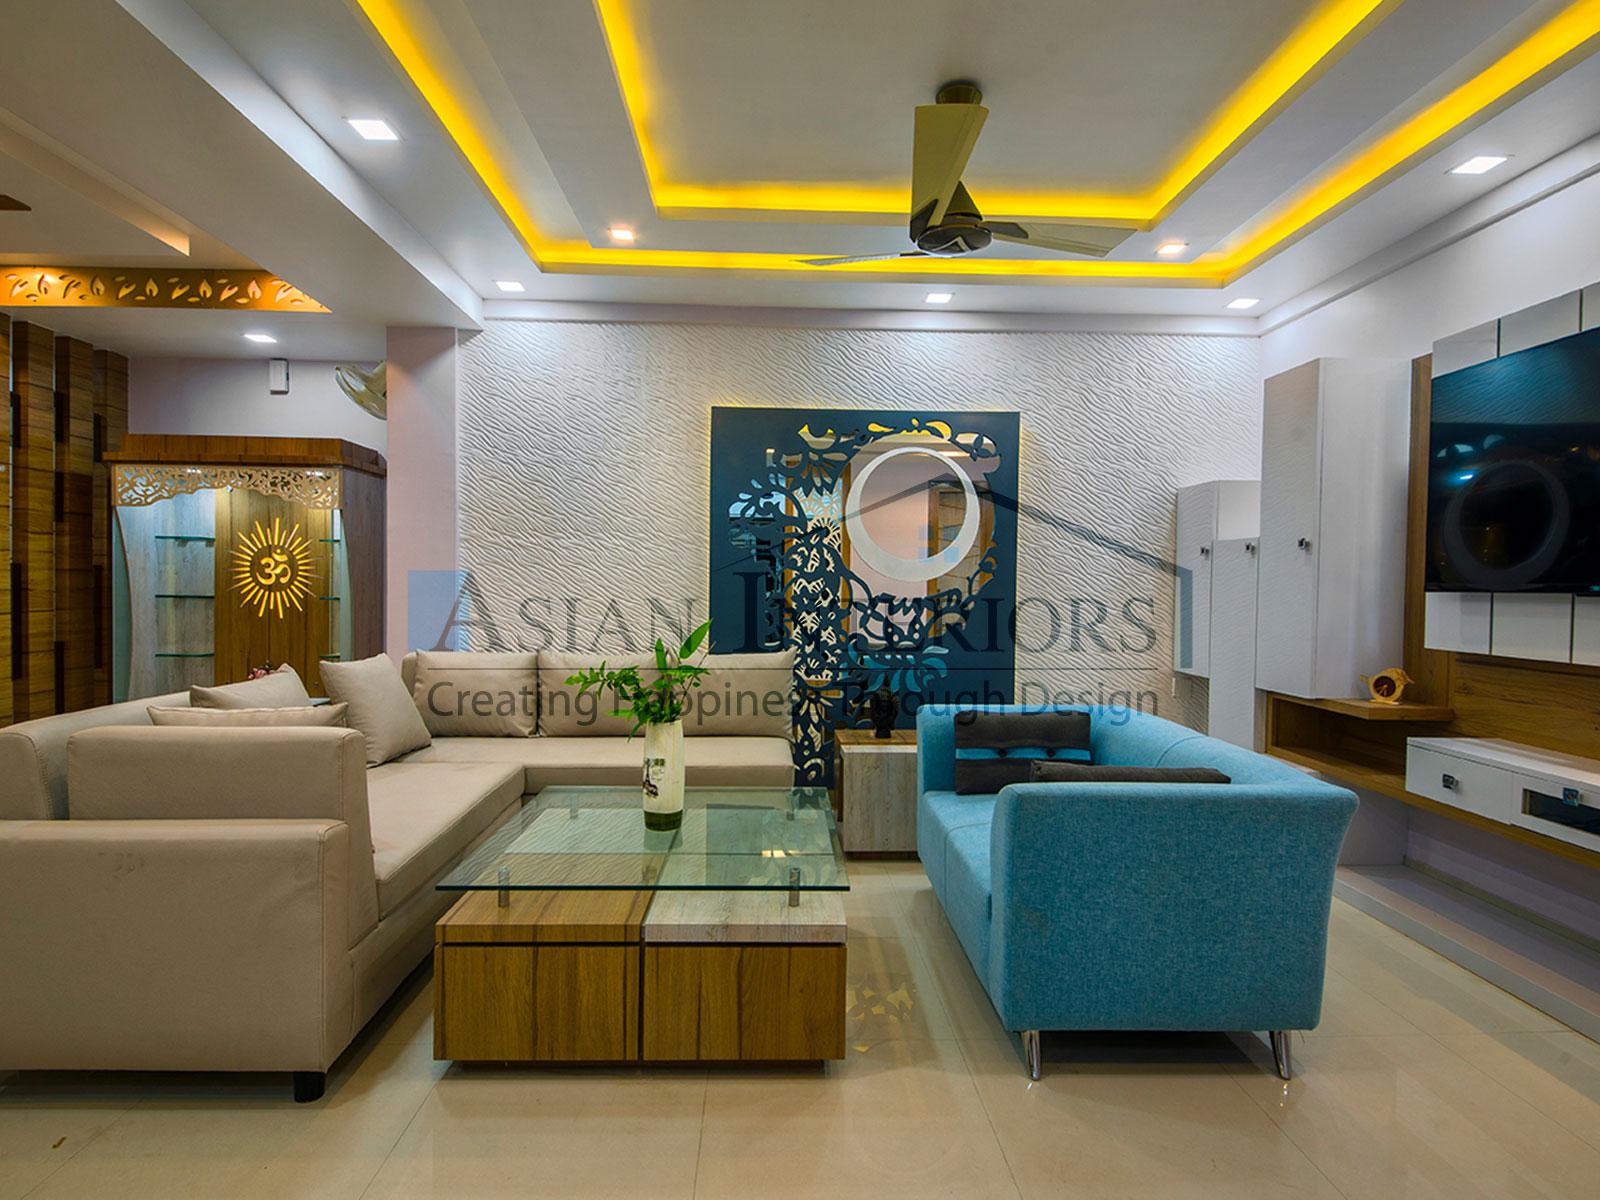 Asian-Interiors-DrawingRoom30